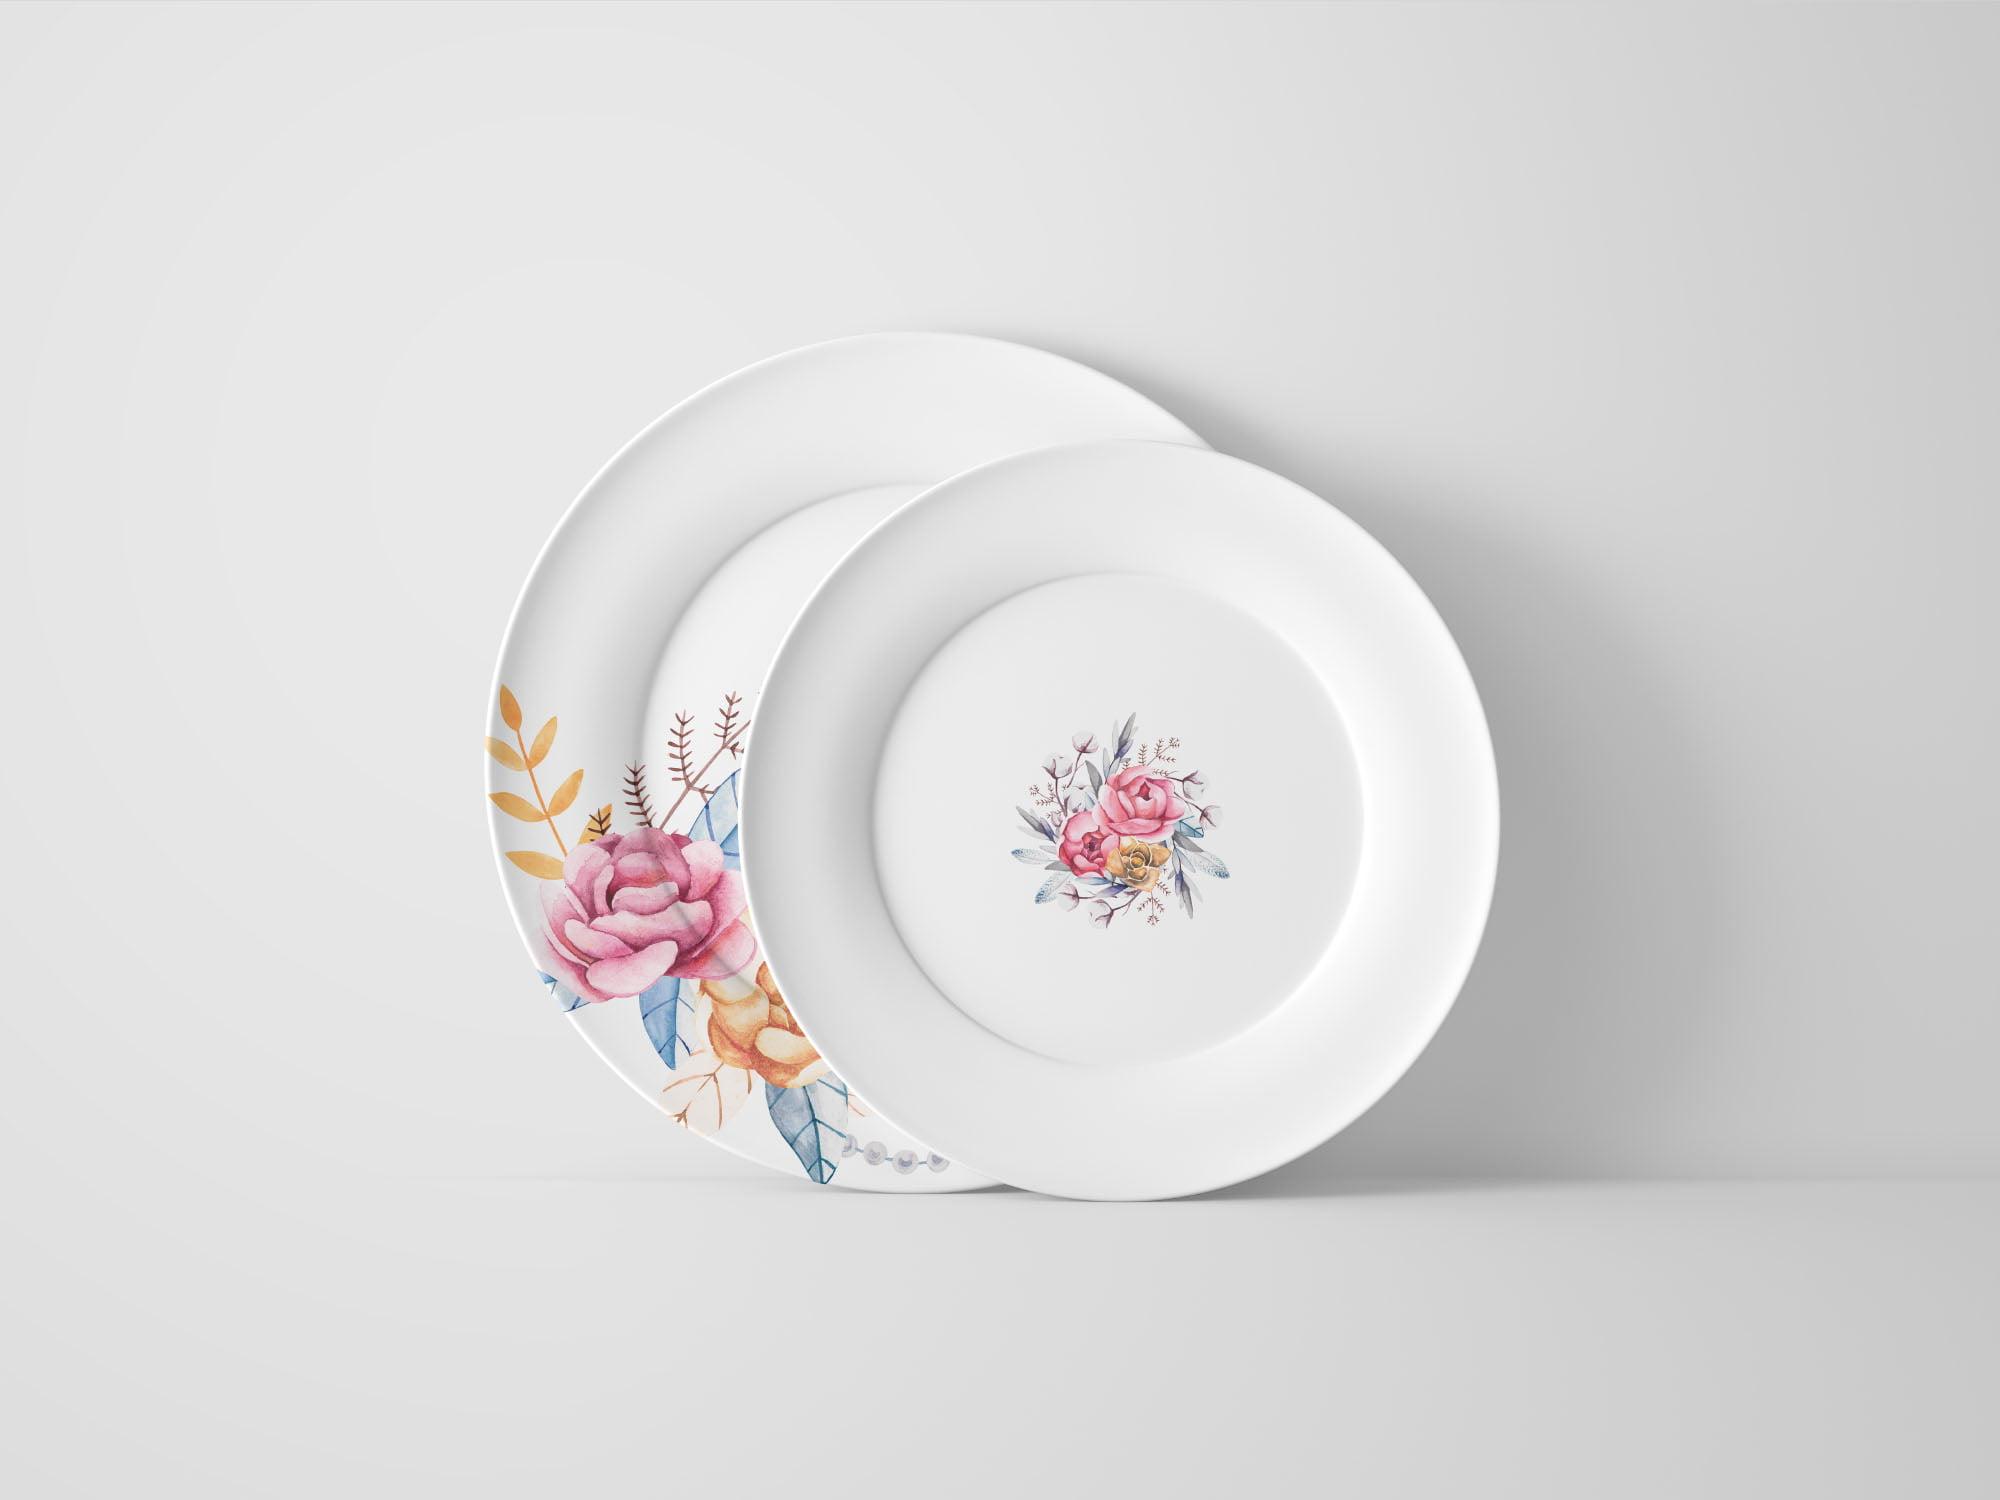 Plate Mockup PSD Templates